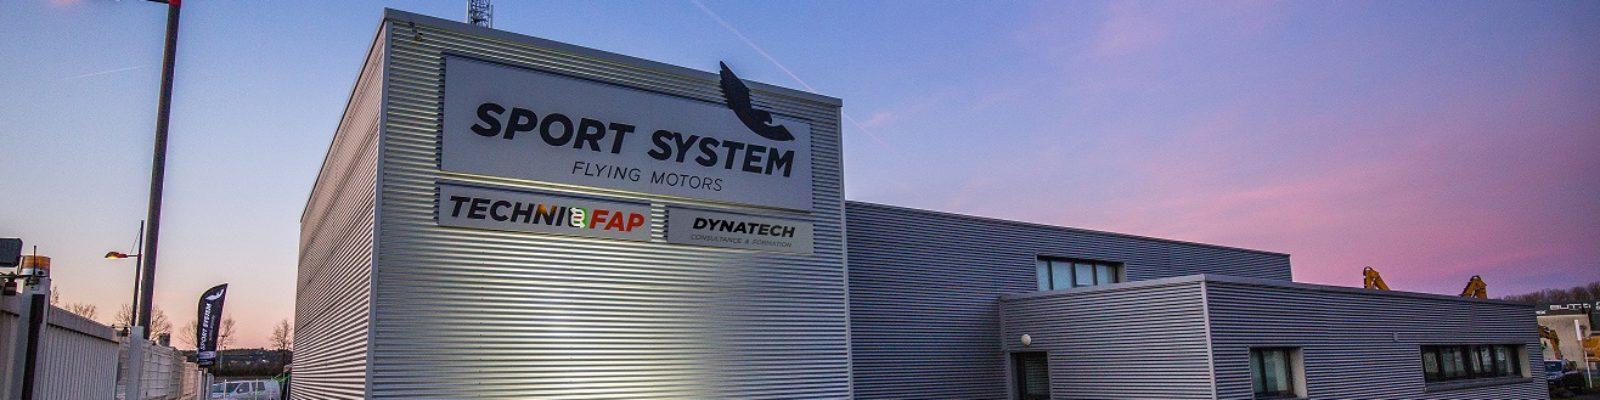 Batiment sport system